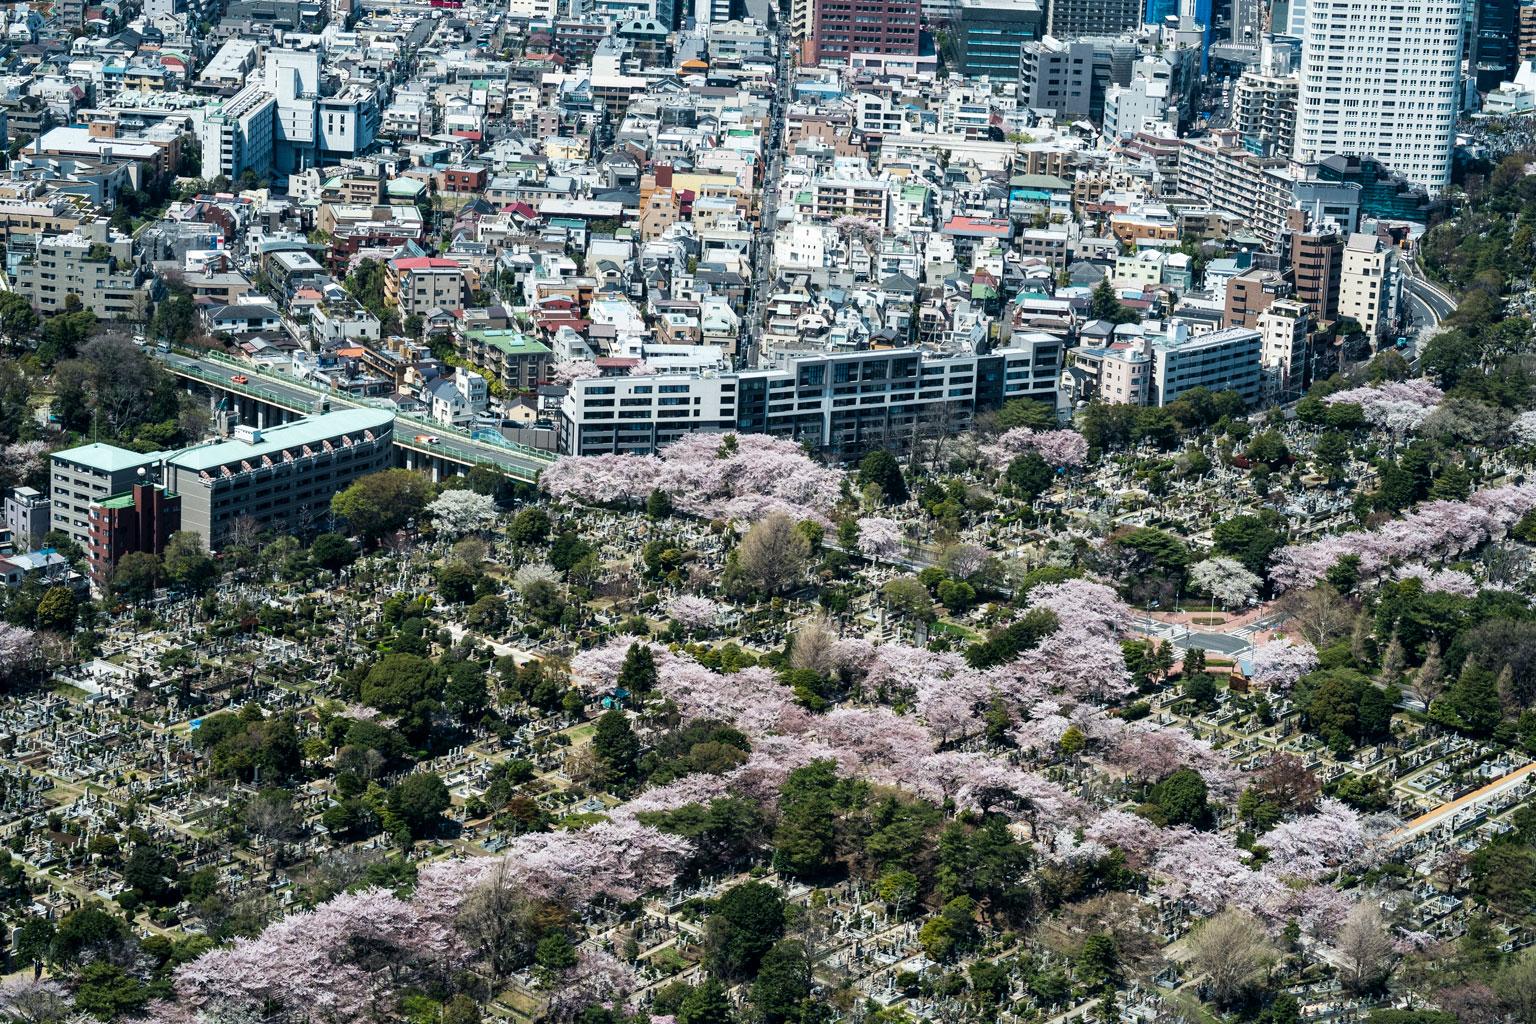 120410_PR_Japan_06_F10816.jpg